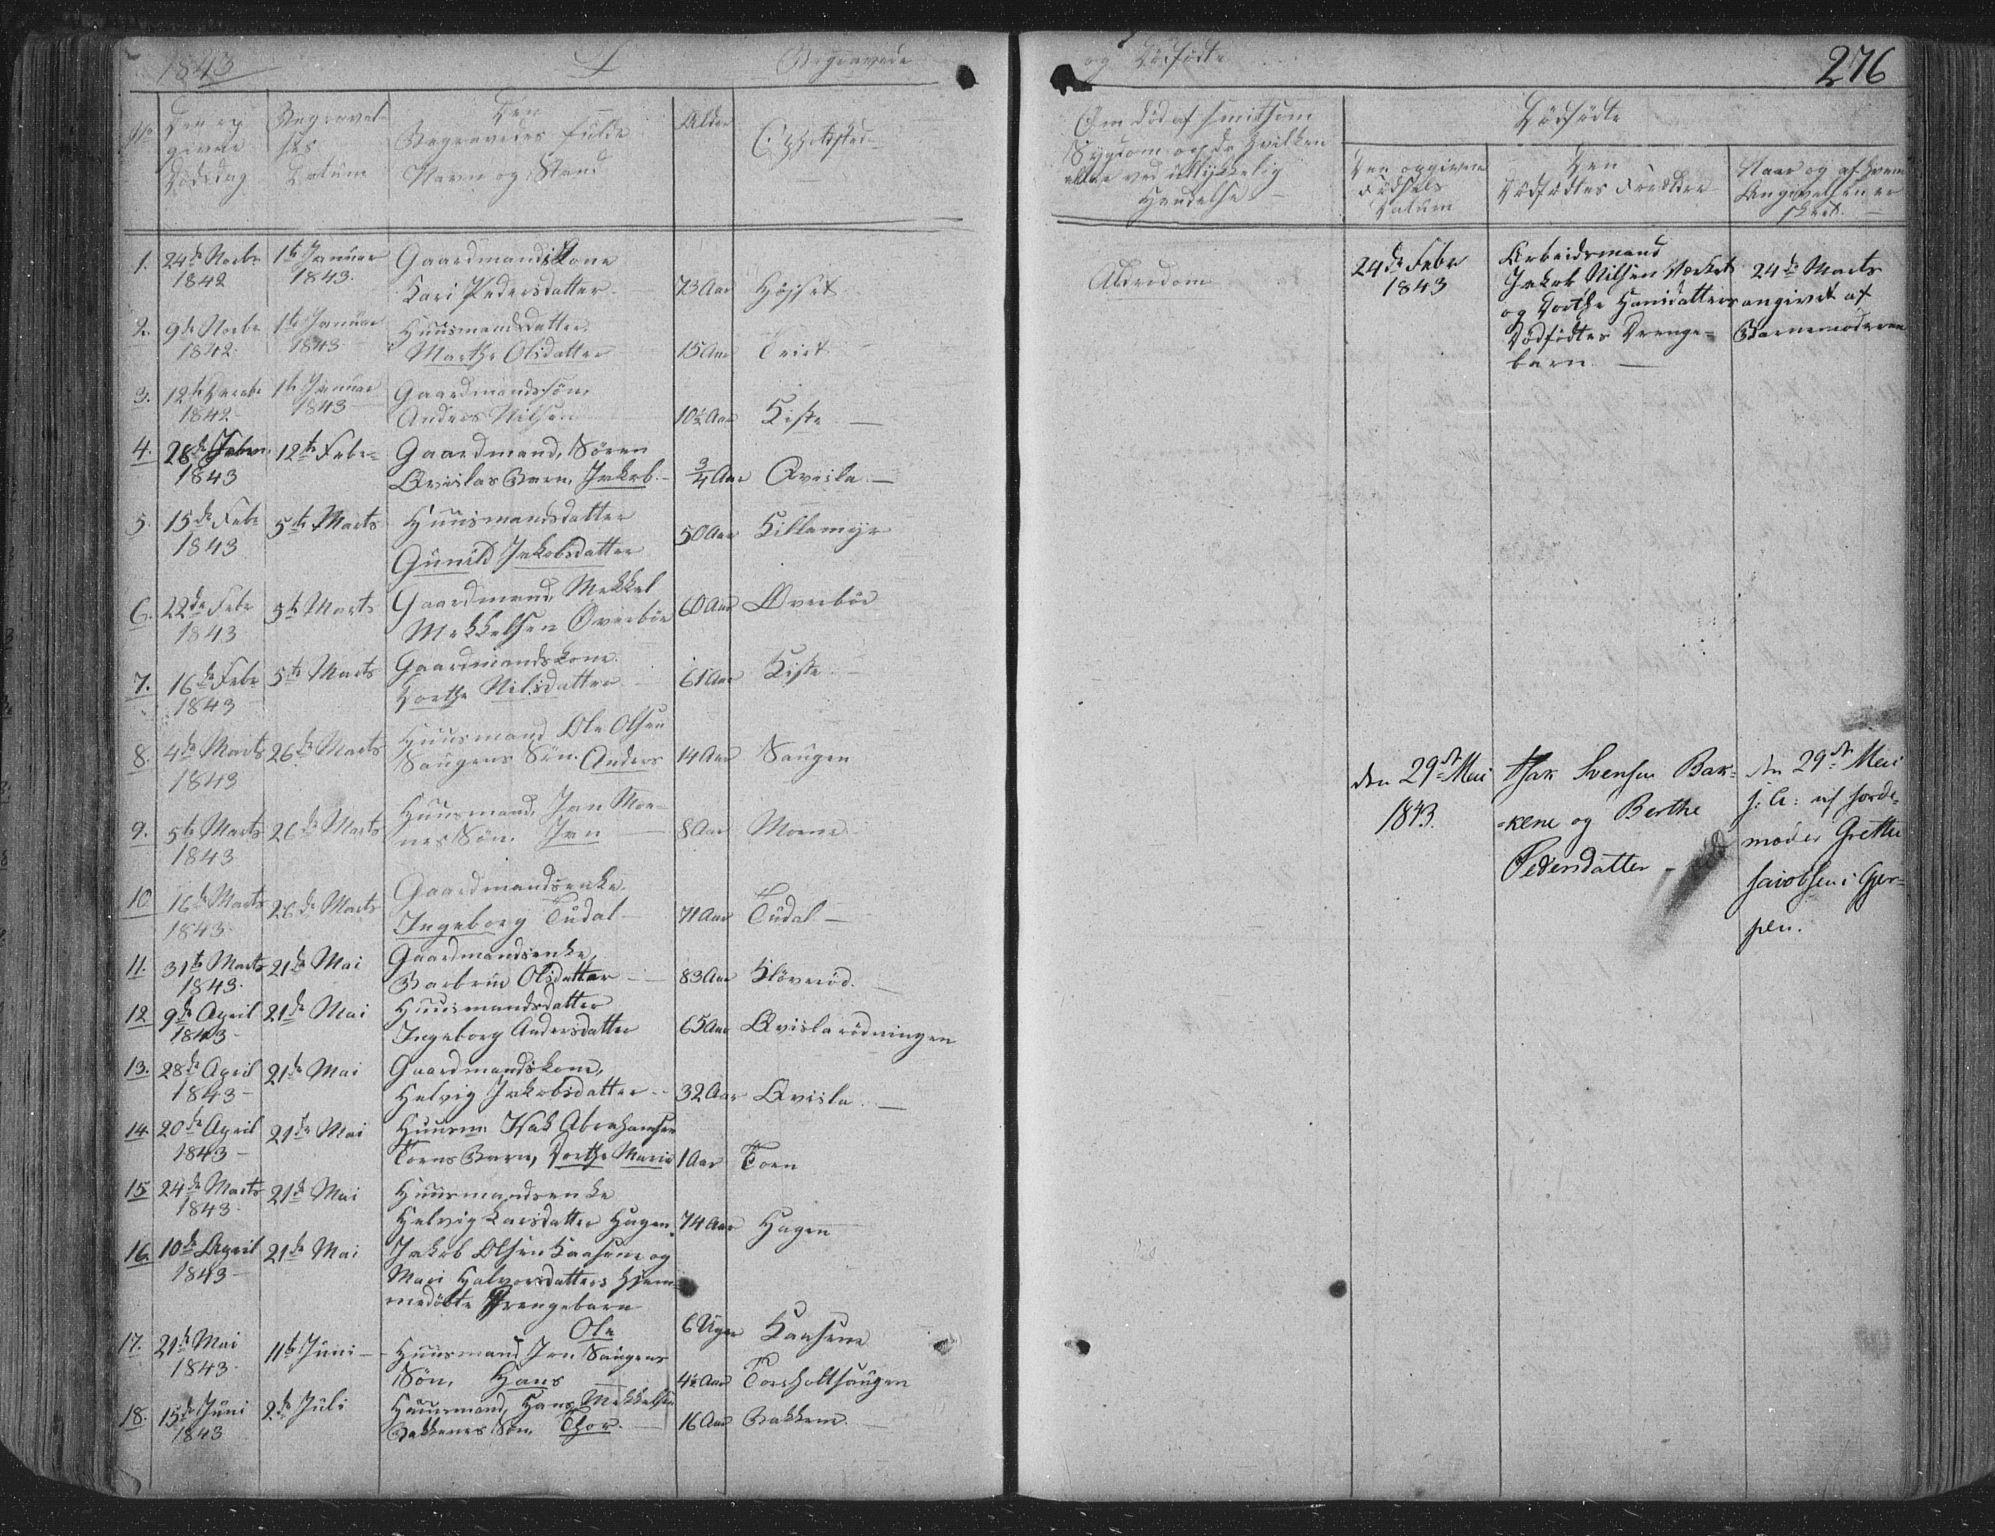 SAKO, Siljan kirkebøker, F/Fa/L0001: Parish register (official) no. 1, 1831-1870, p. 276